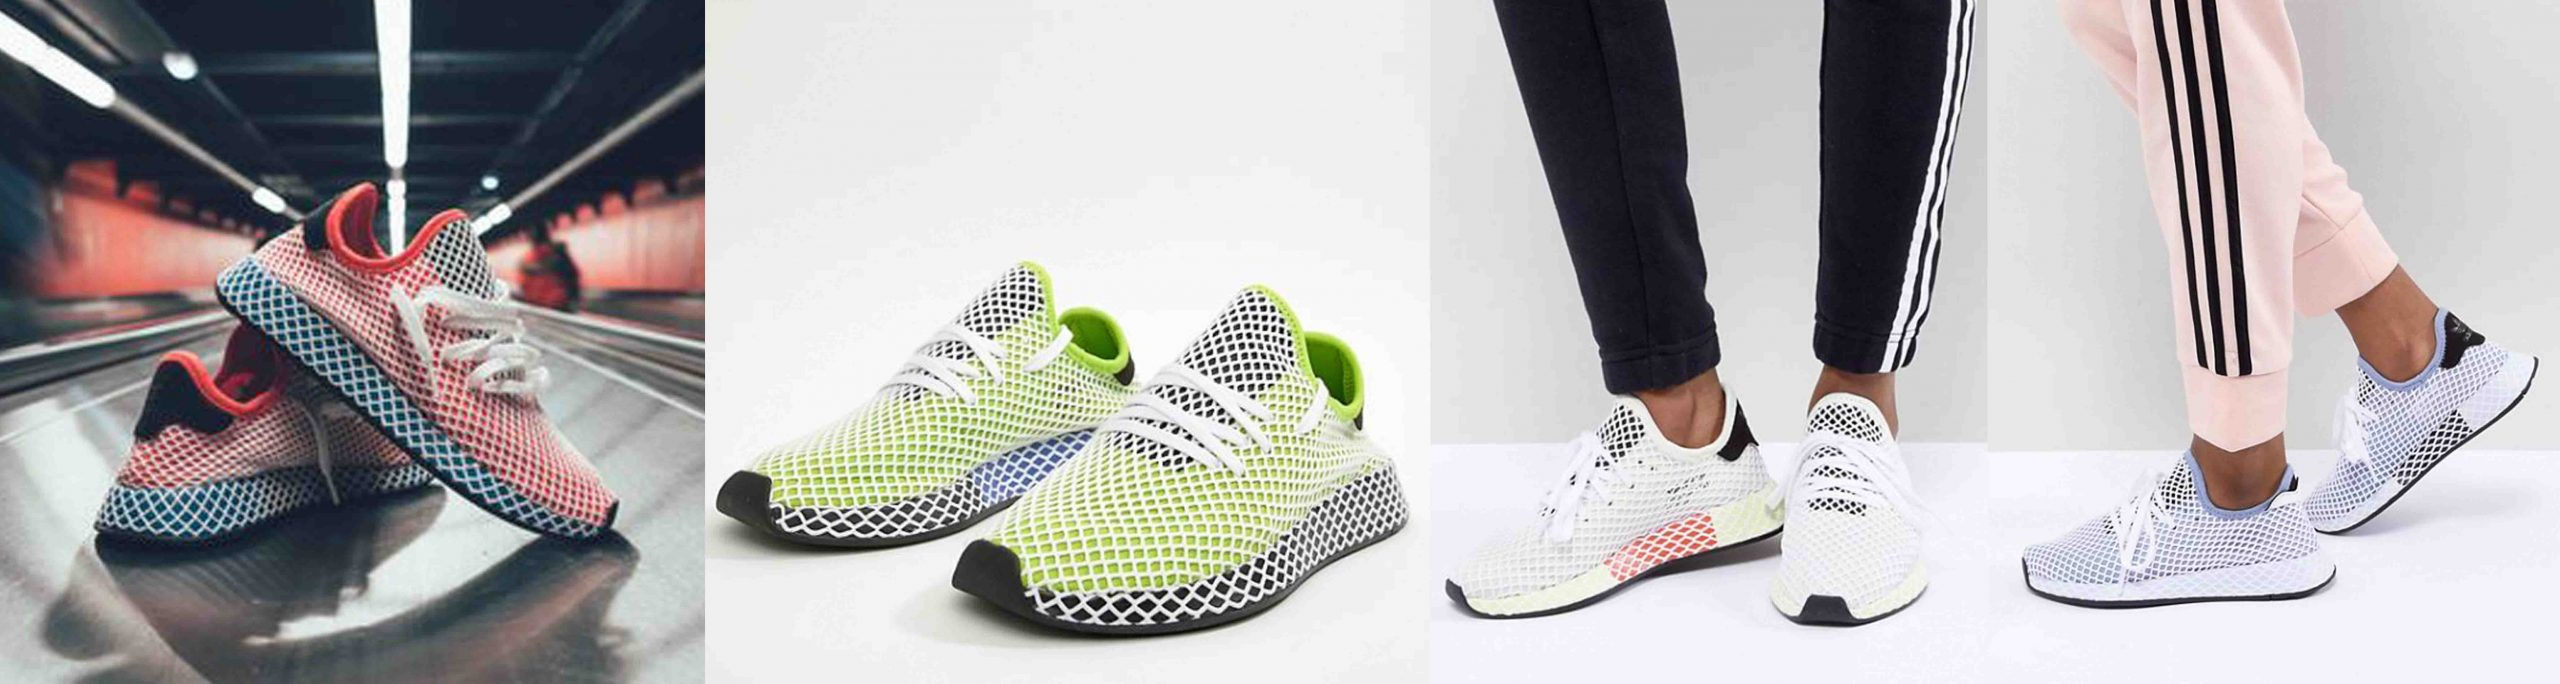 adidas sneakers 2018